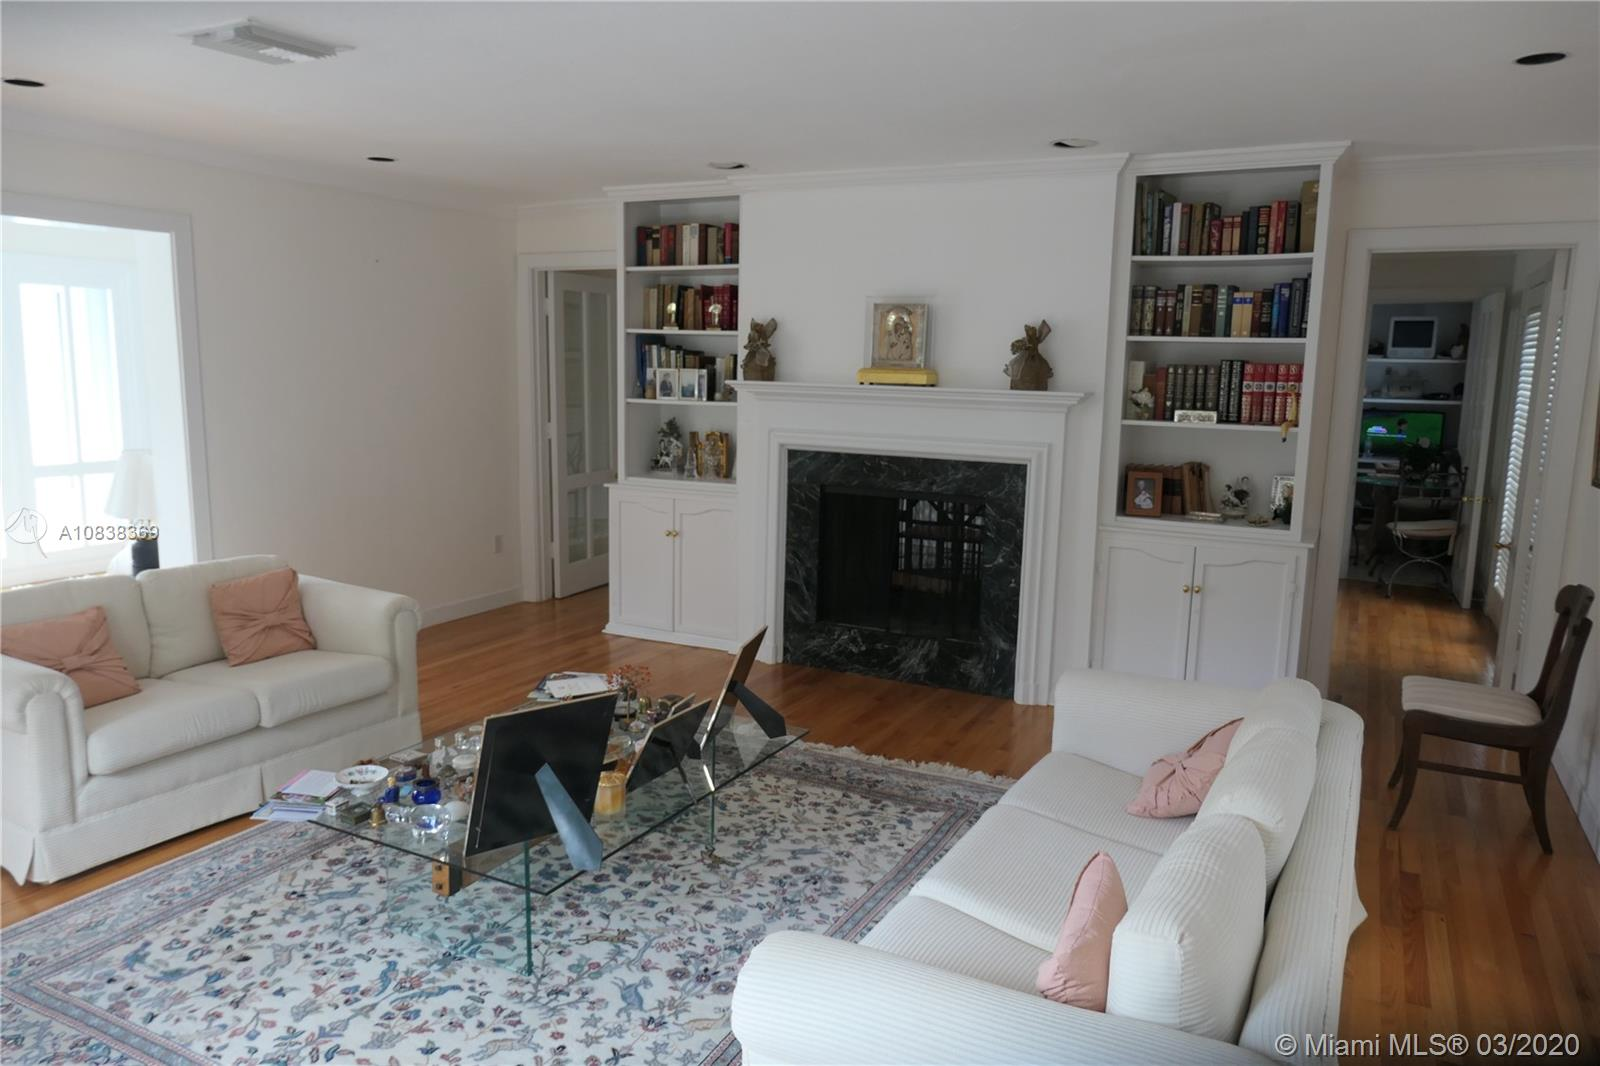 4801 San Amaro Dr, Coral Gables, Florida 33146, 3 Bedrooms Bedrooms, ,3 BathroomsBathrooms,Residential,For Sale,4801 San Amaro Dr,A10838369